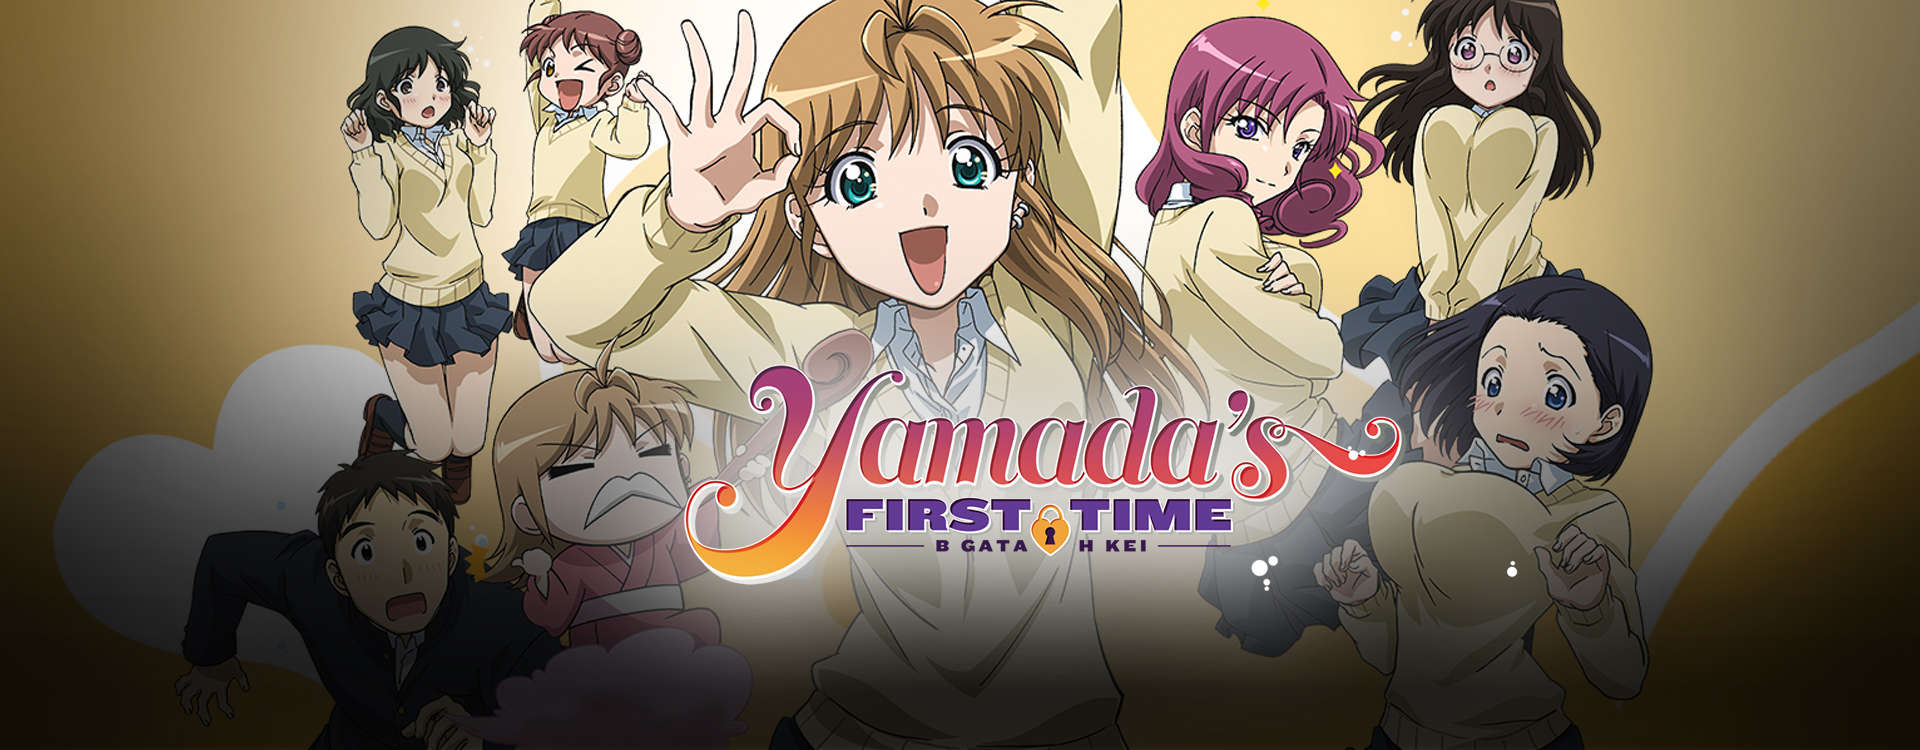 Yamada's First Time: B Gata H Kei